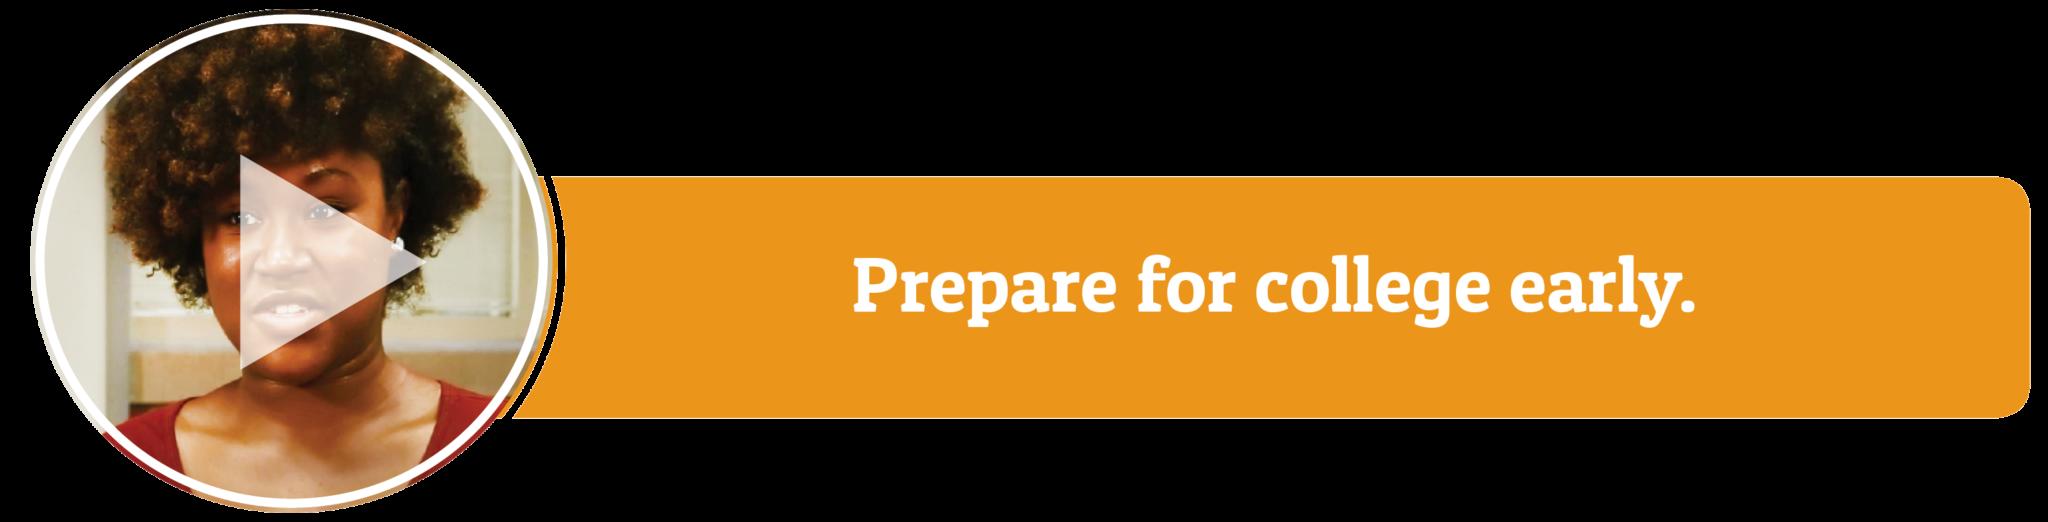 Video: Prepare for college early